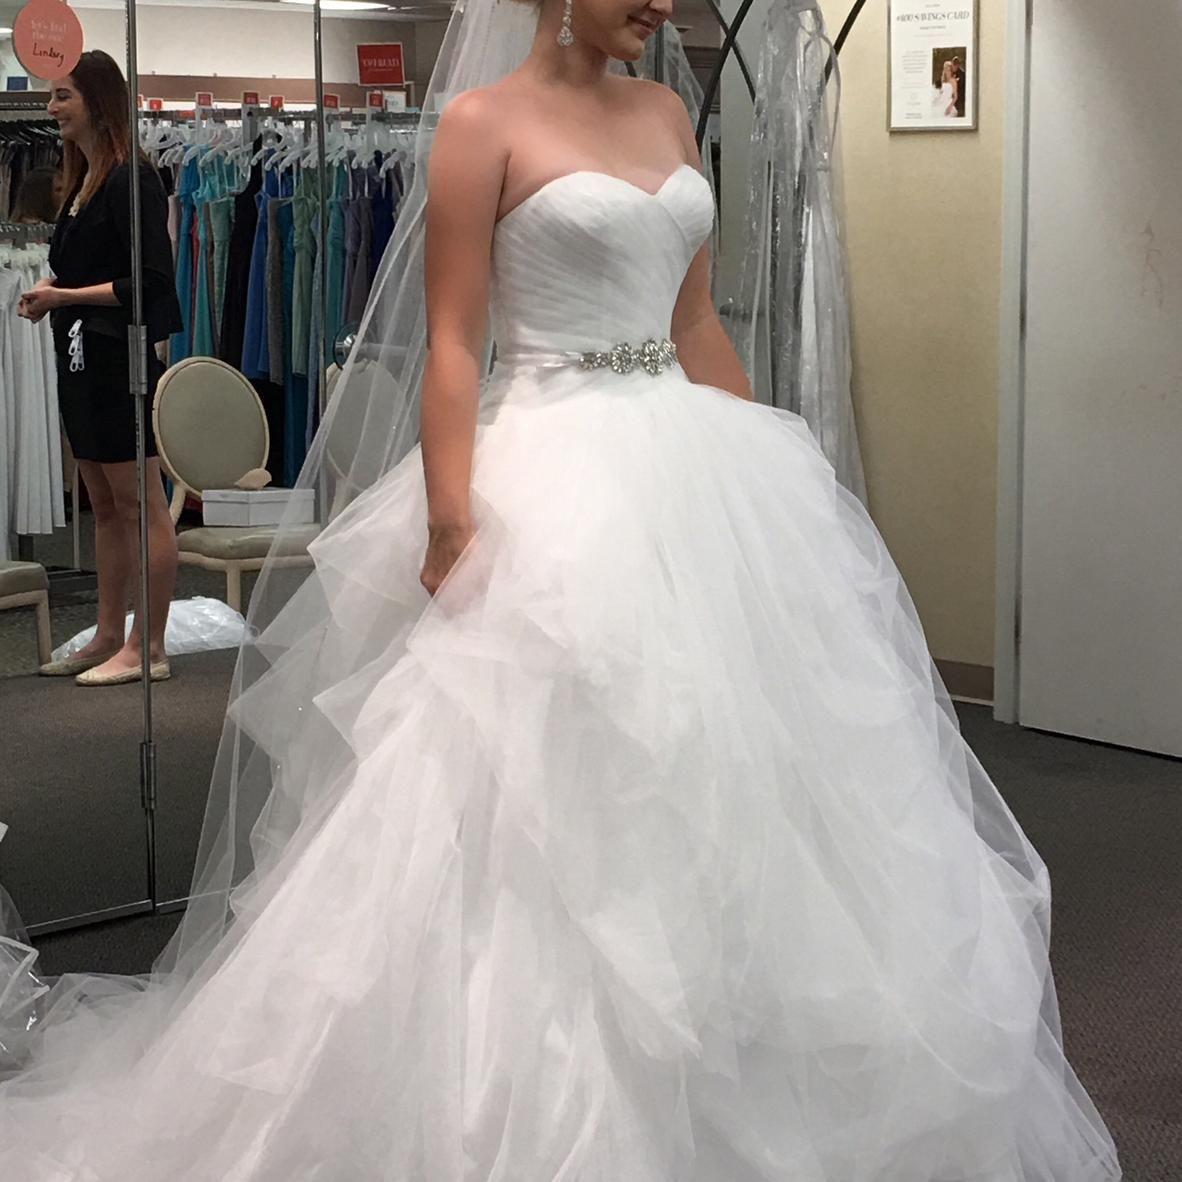 22+ White dress wedding history ideas in 2021